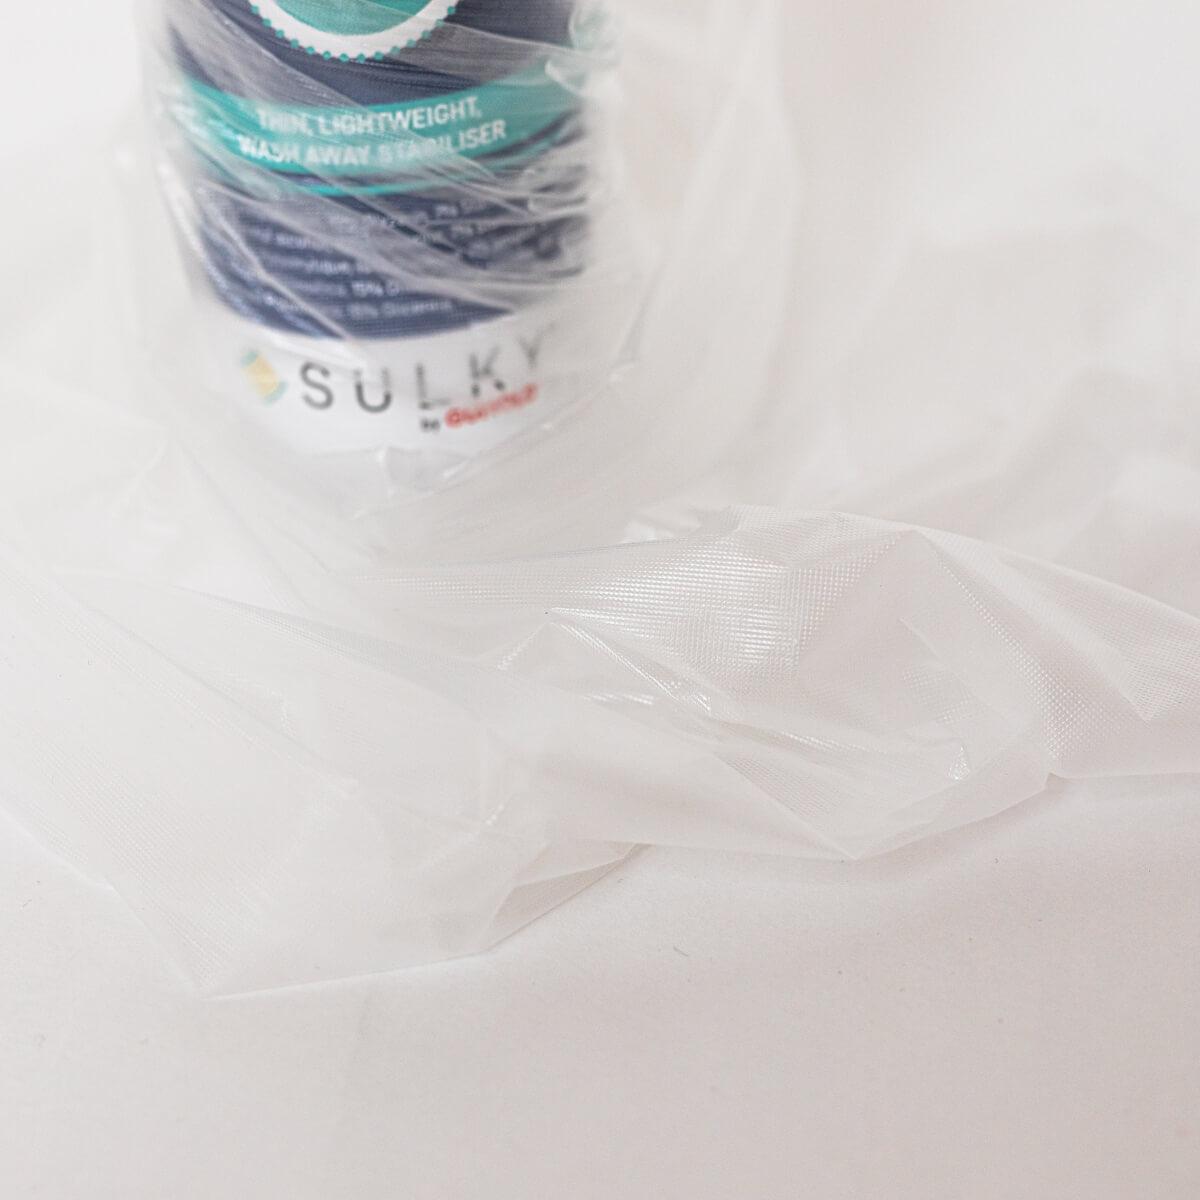 SULKY SOLVY, 25cm x 10m